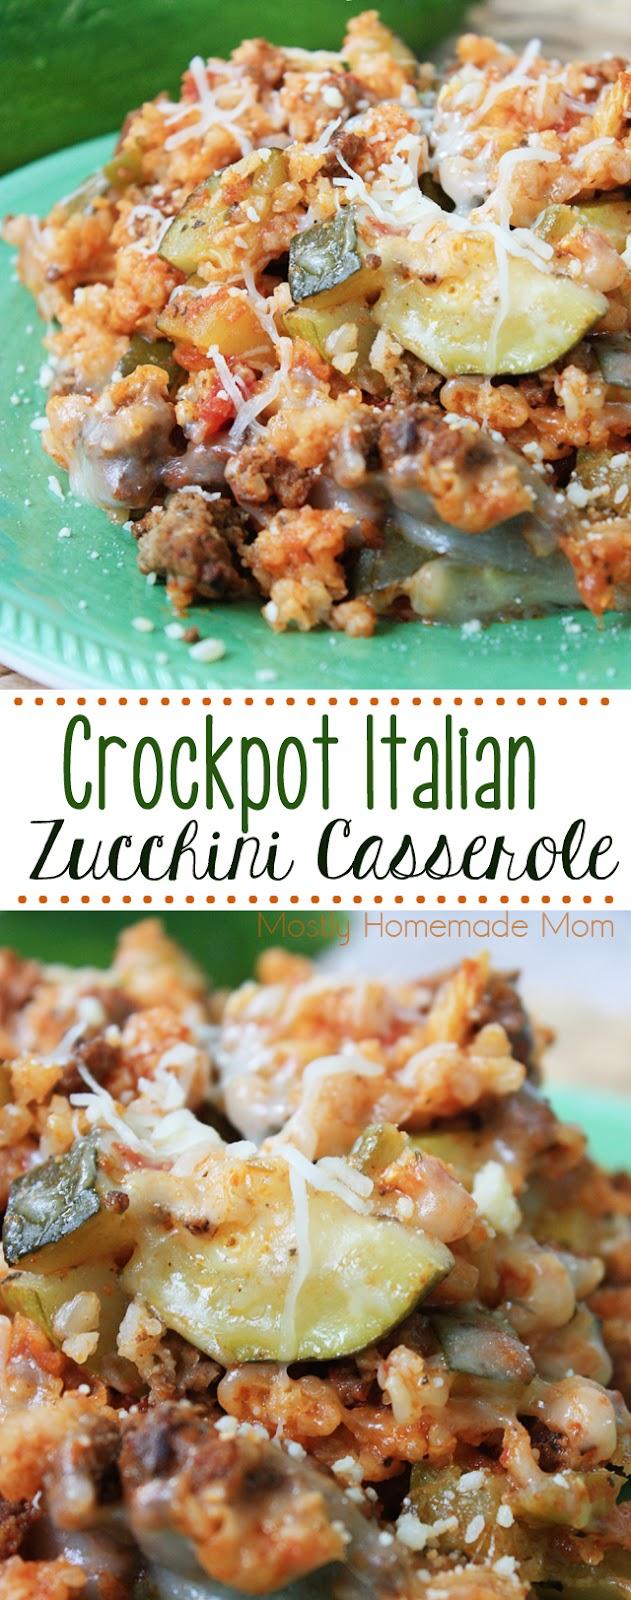 Crockpot Italian Zucchini Casserole slow cooker zucchini casserole